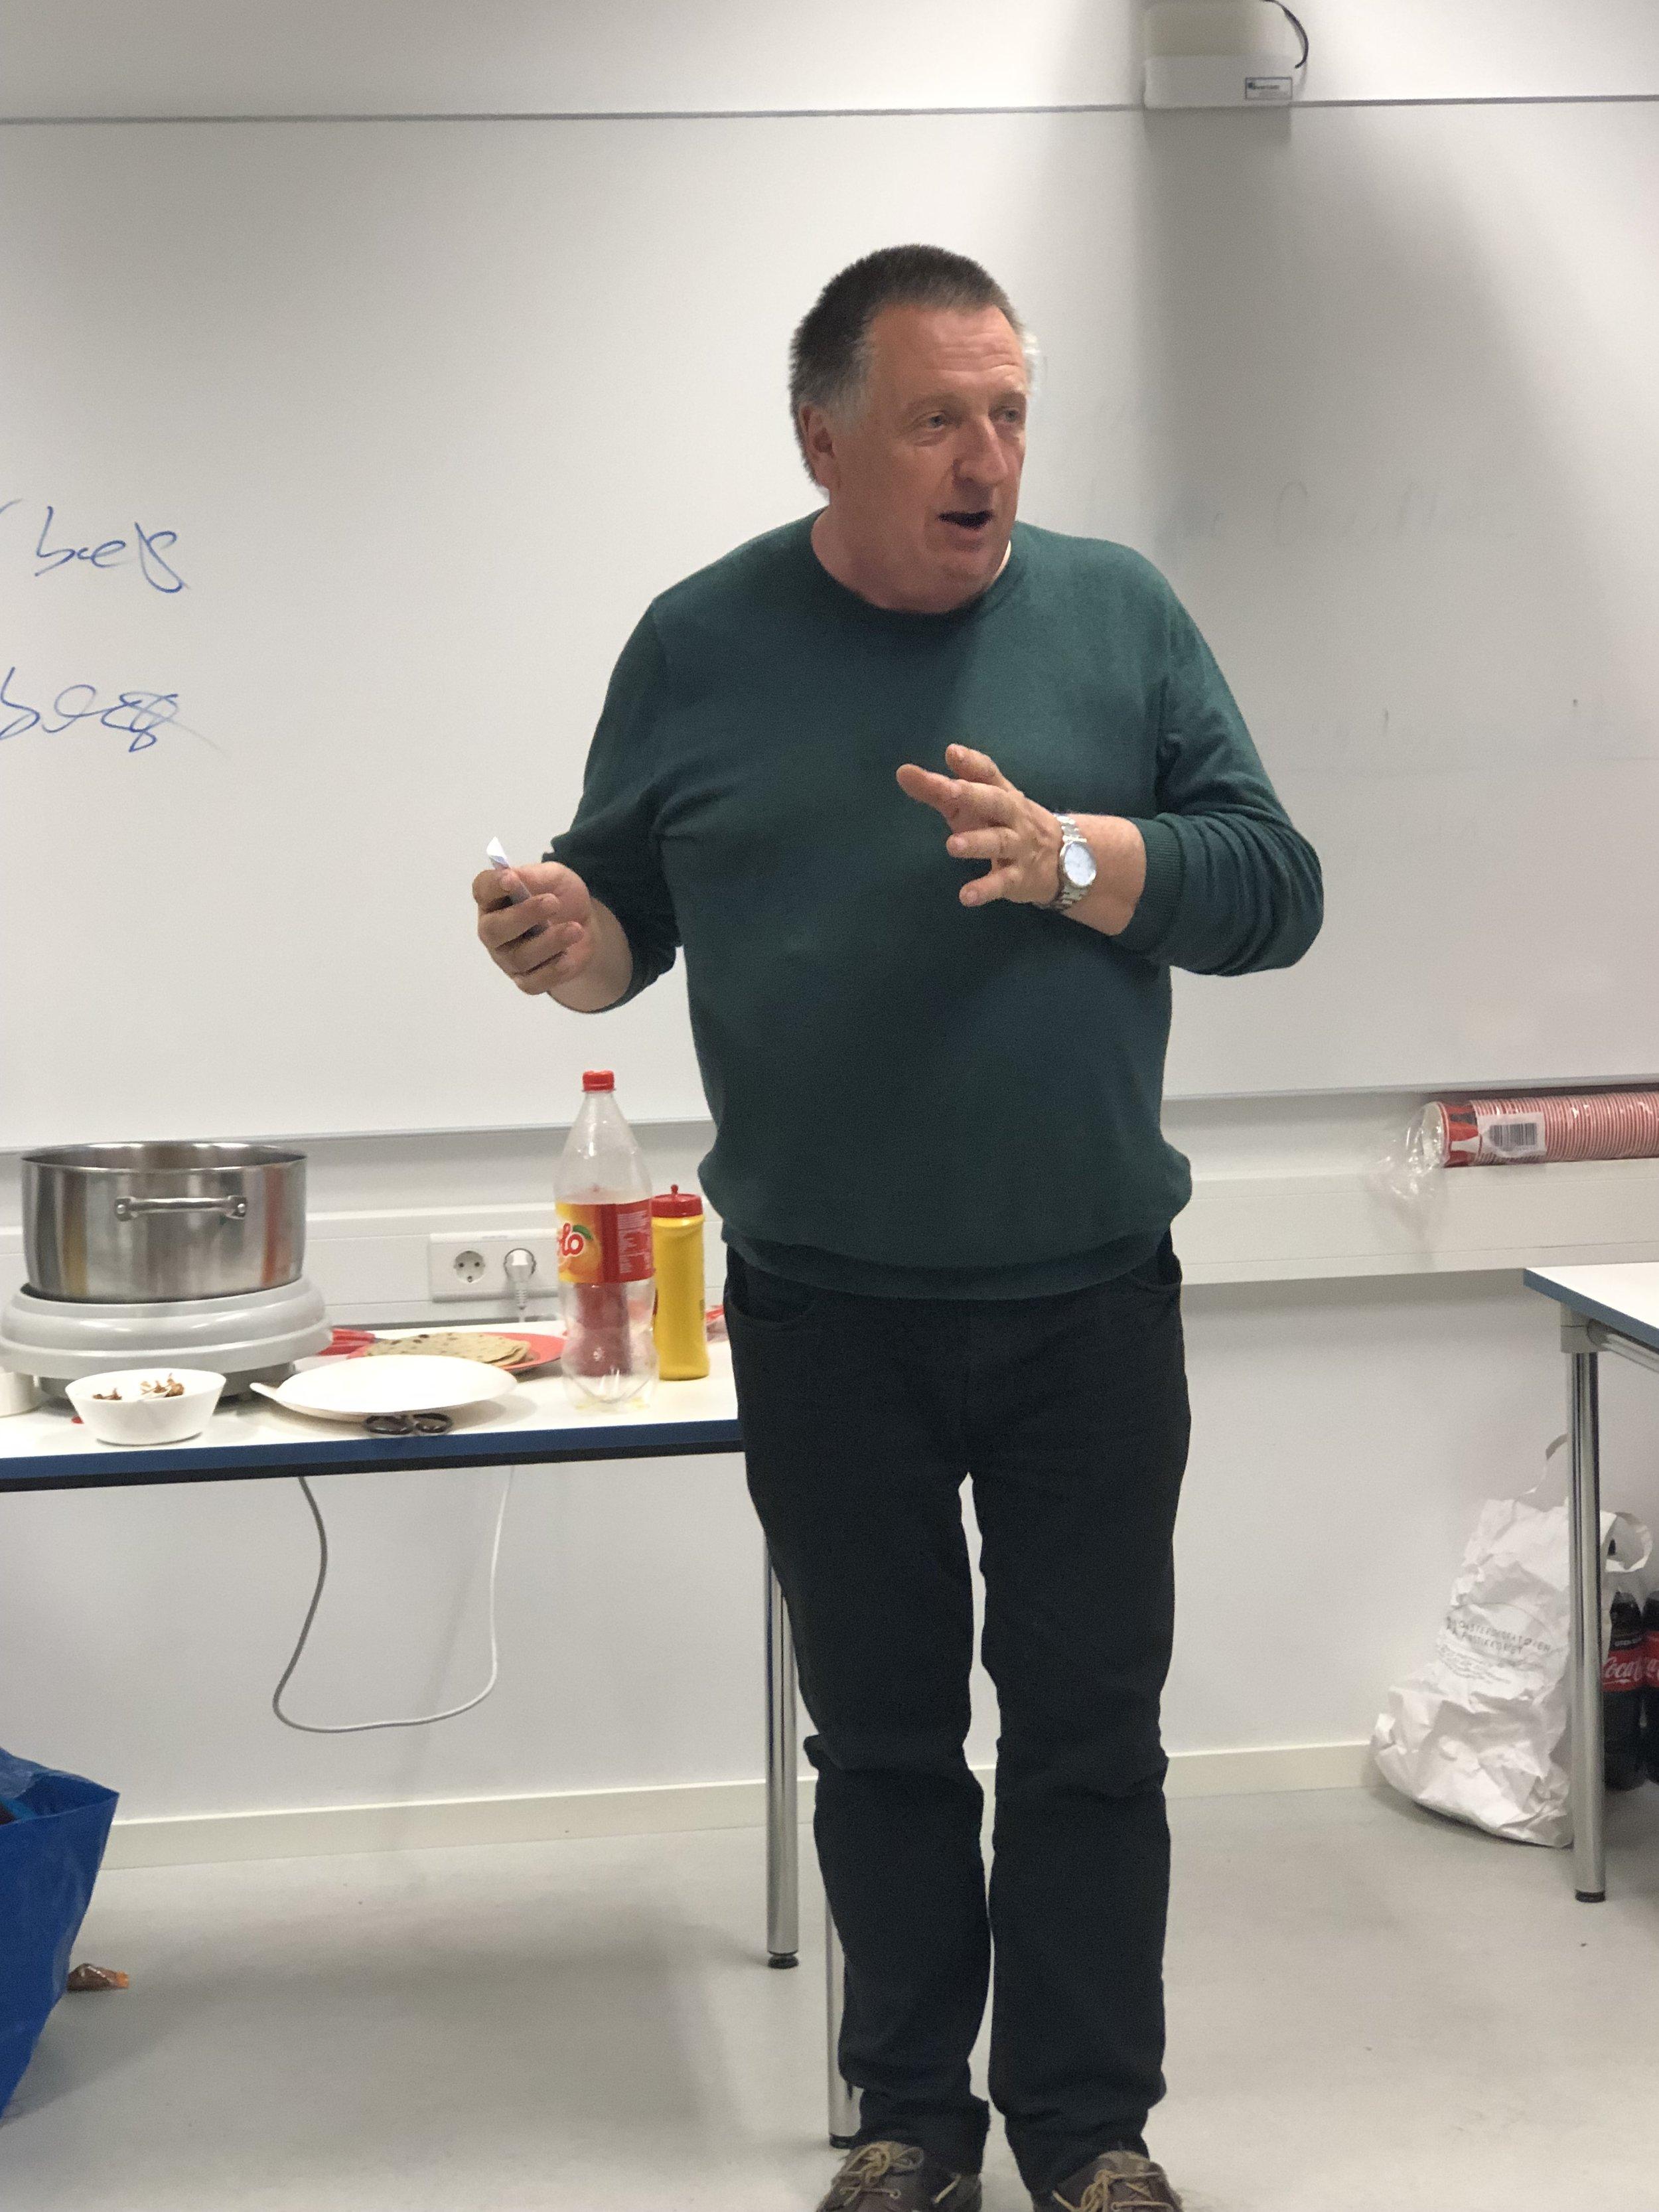 Henning Hagelund skaper spenning rundt Perseprisen